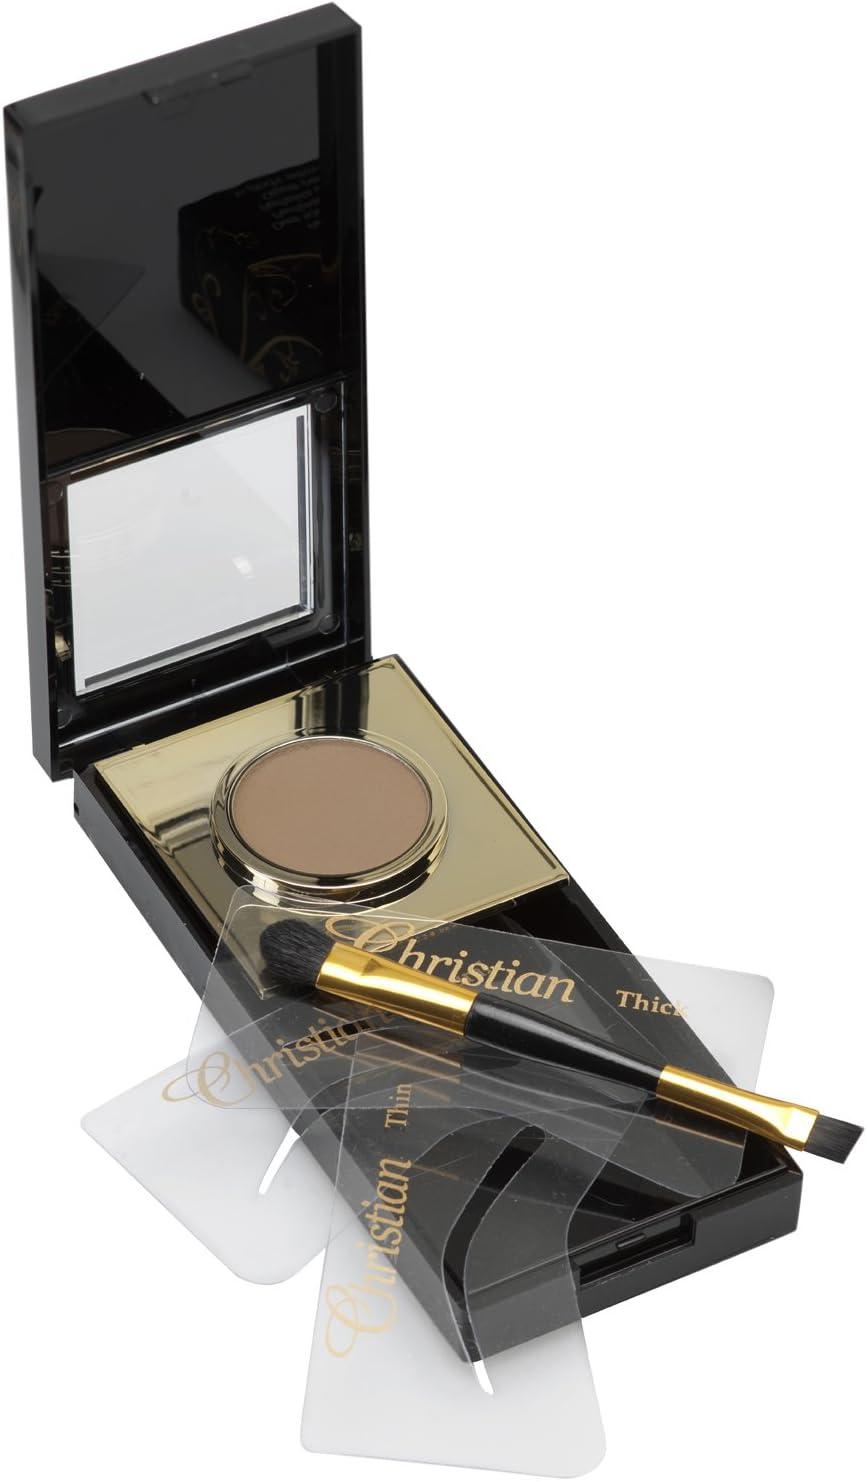 Kit Cejas cristiana maquillaje semipermanente de cejas Marrón Oscuro